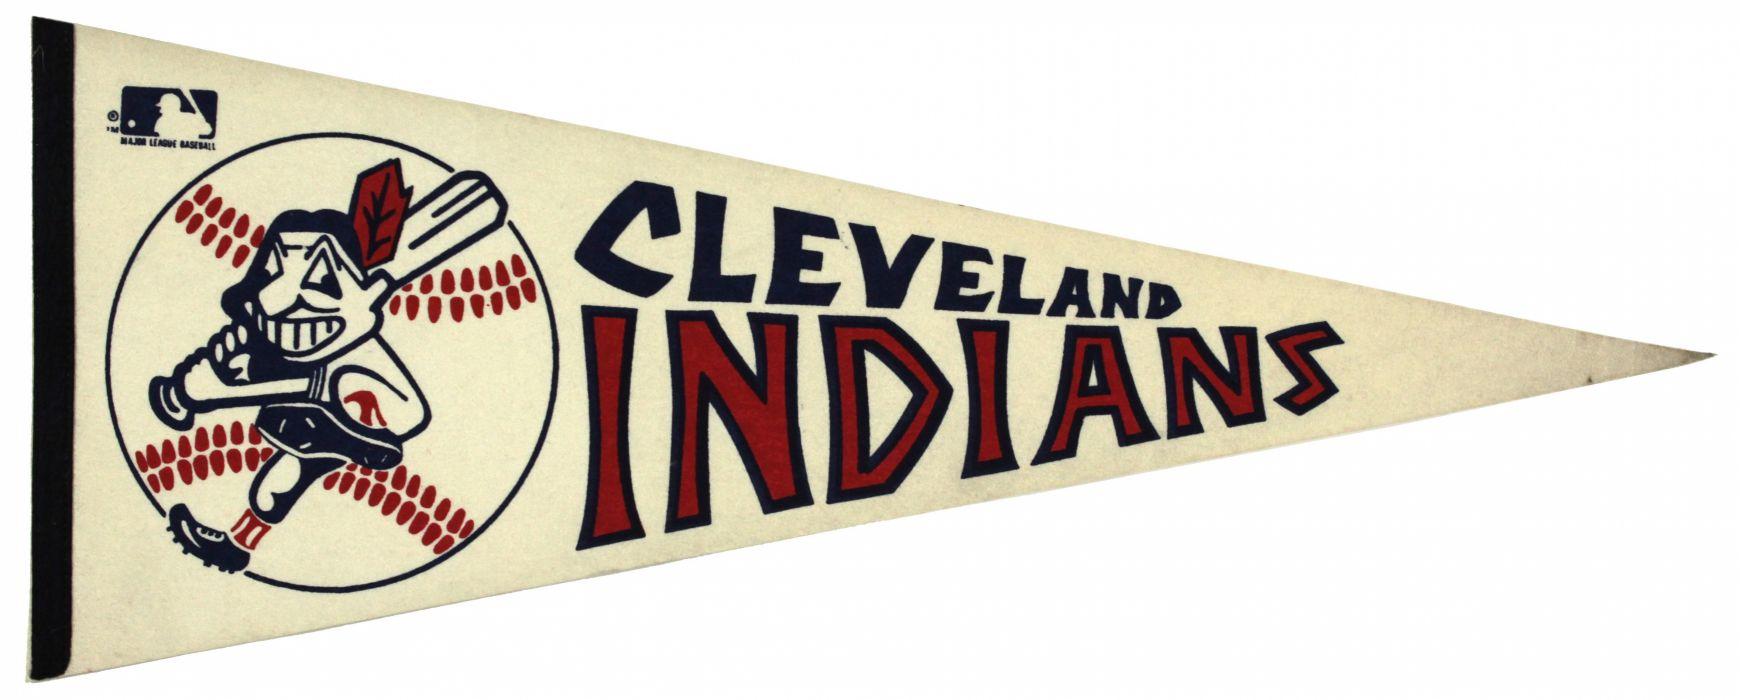 CLEVELAND INDIANS mlb baseball (2) wallpaper